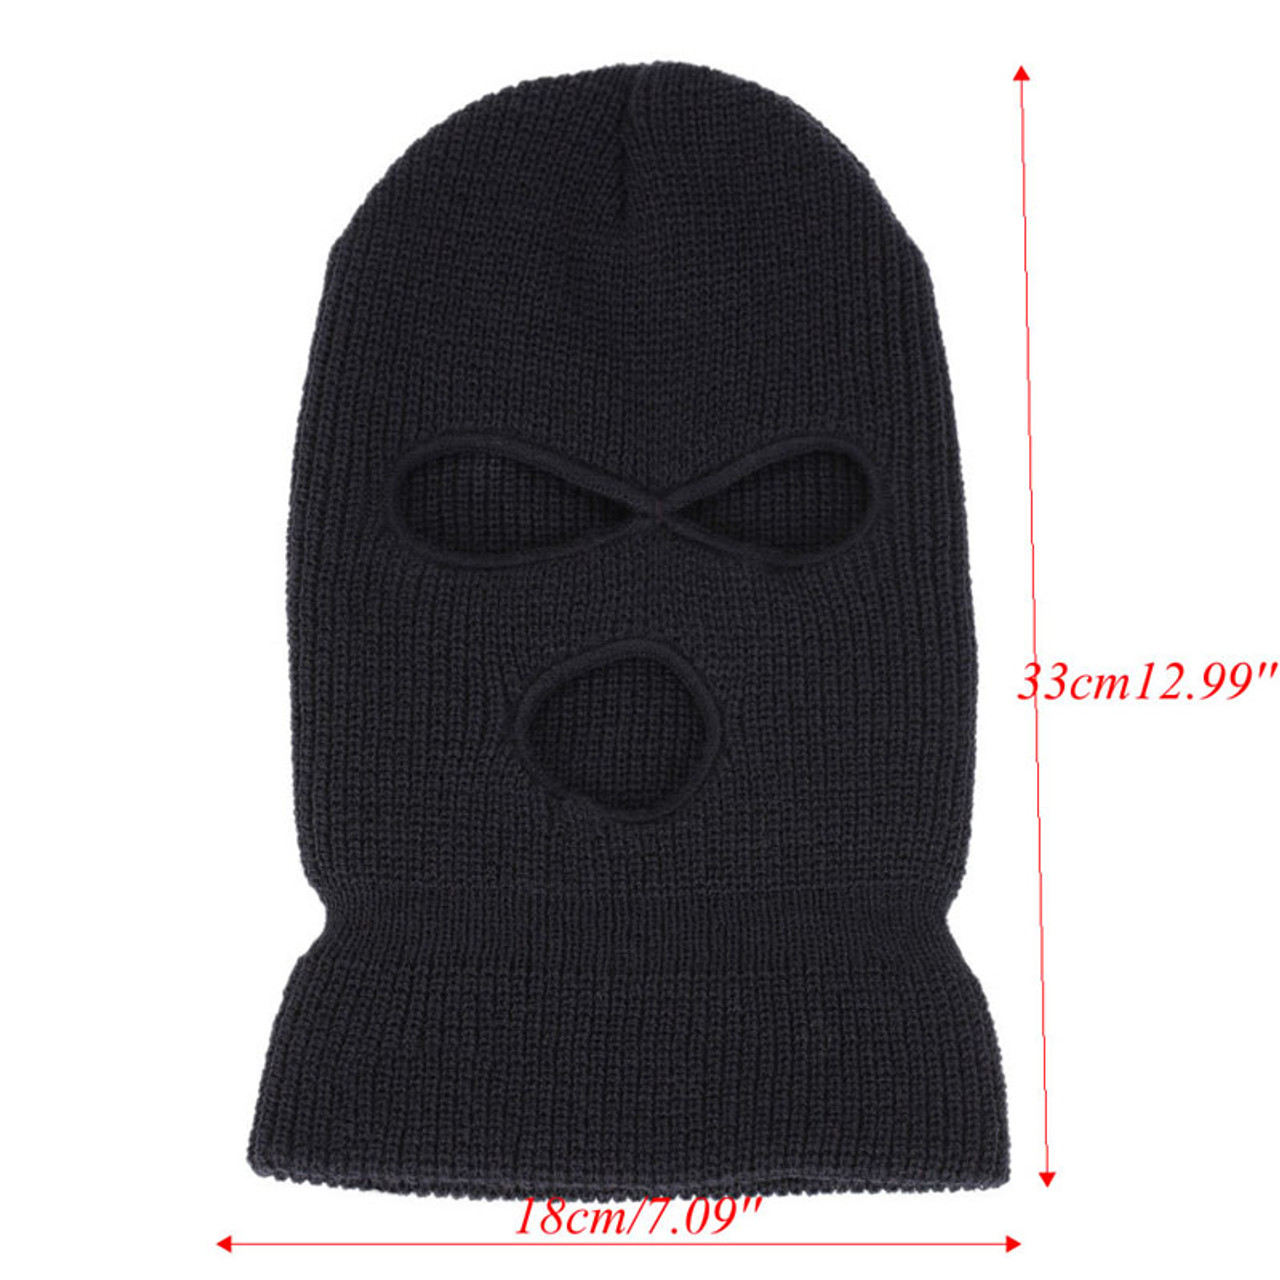 f019632a4f654 ... 3 Hole Ski Mask Balaclava Black Knit Hat Face Shield Beanie Cap Snow  Winter Warm